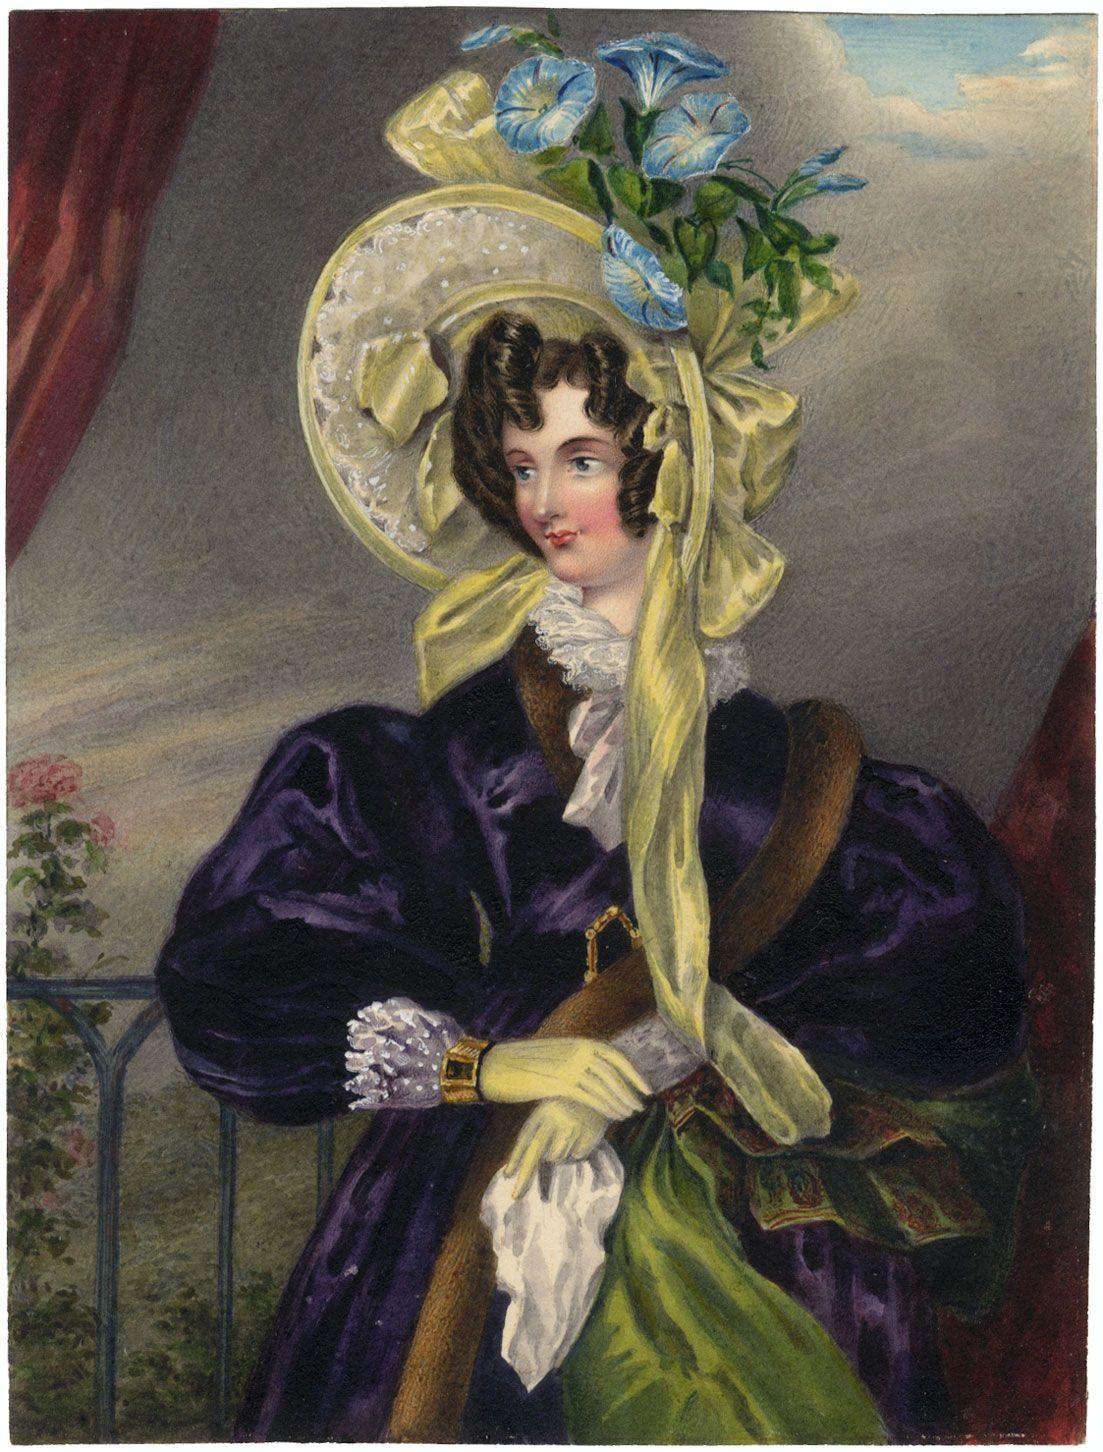 The Countess original painting